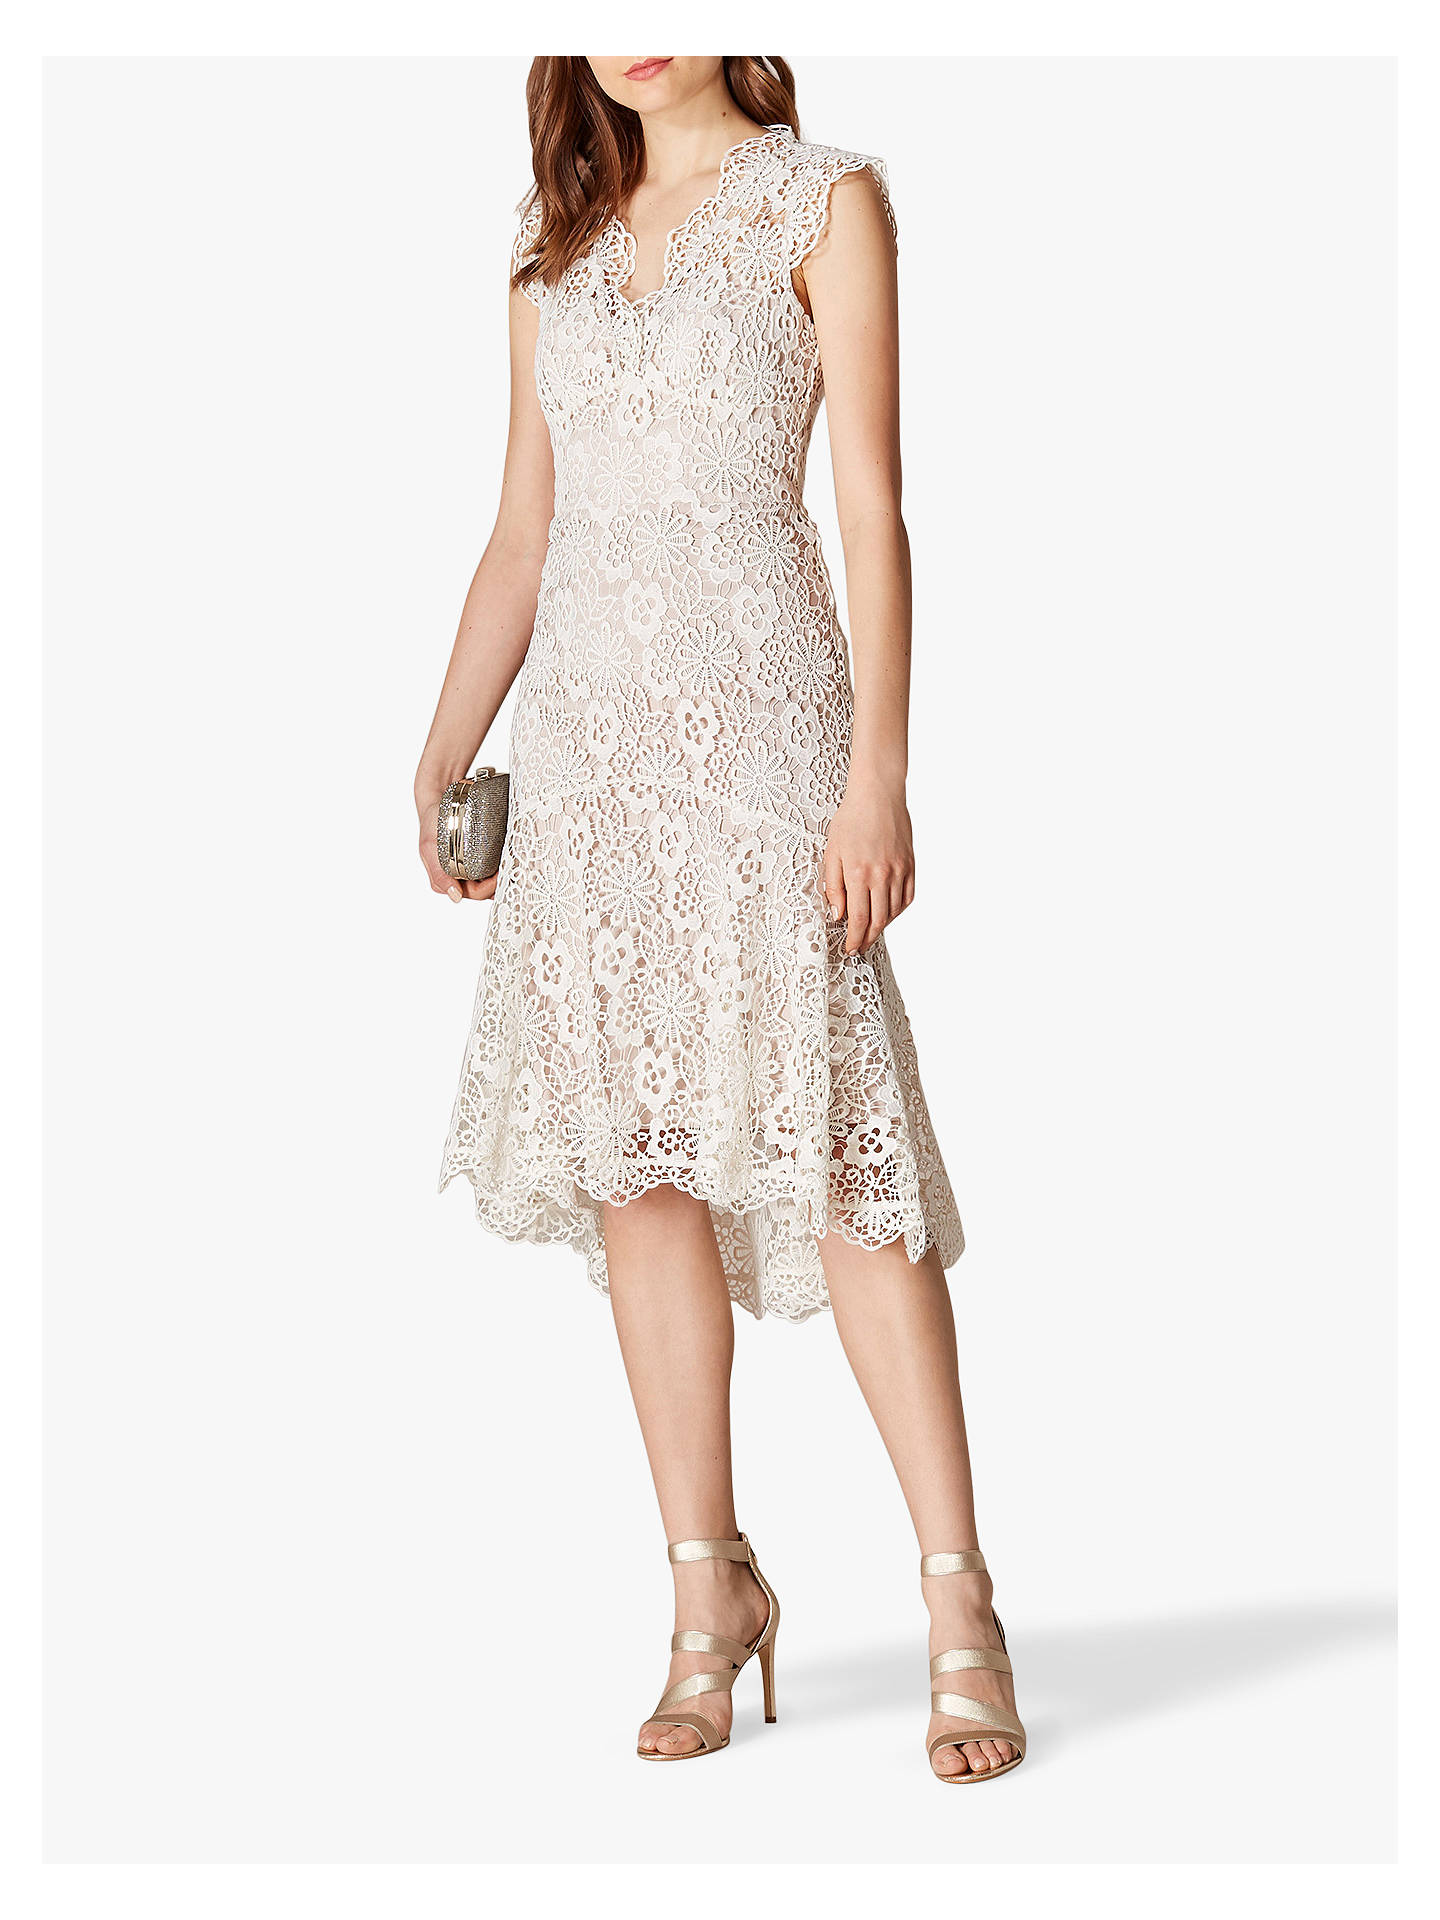 Karen Millen Floral Lace Dress Neutral At John Lewis Partners